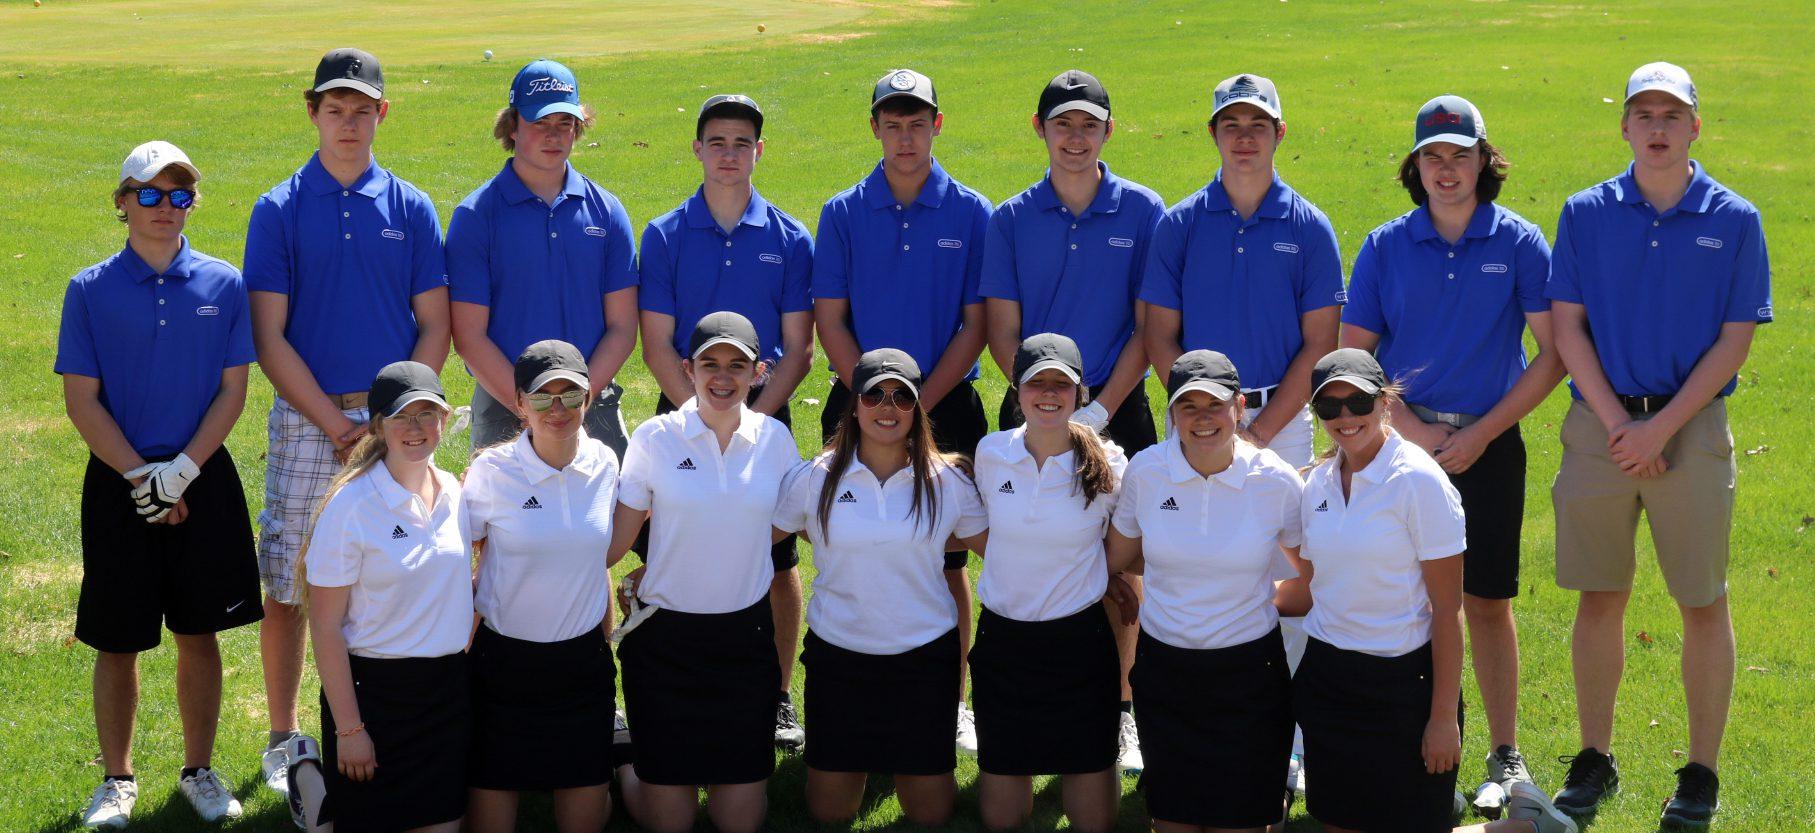 Golf-team pic